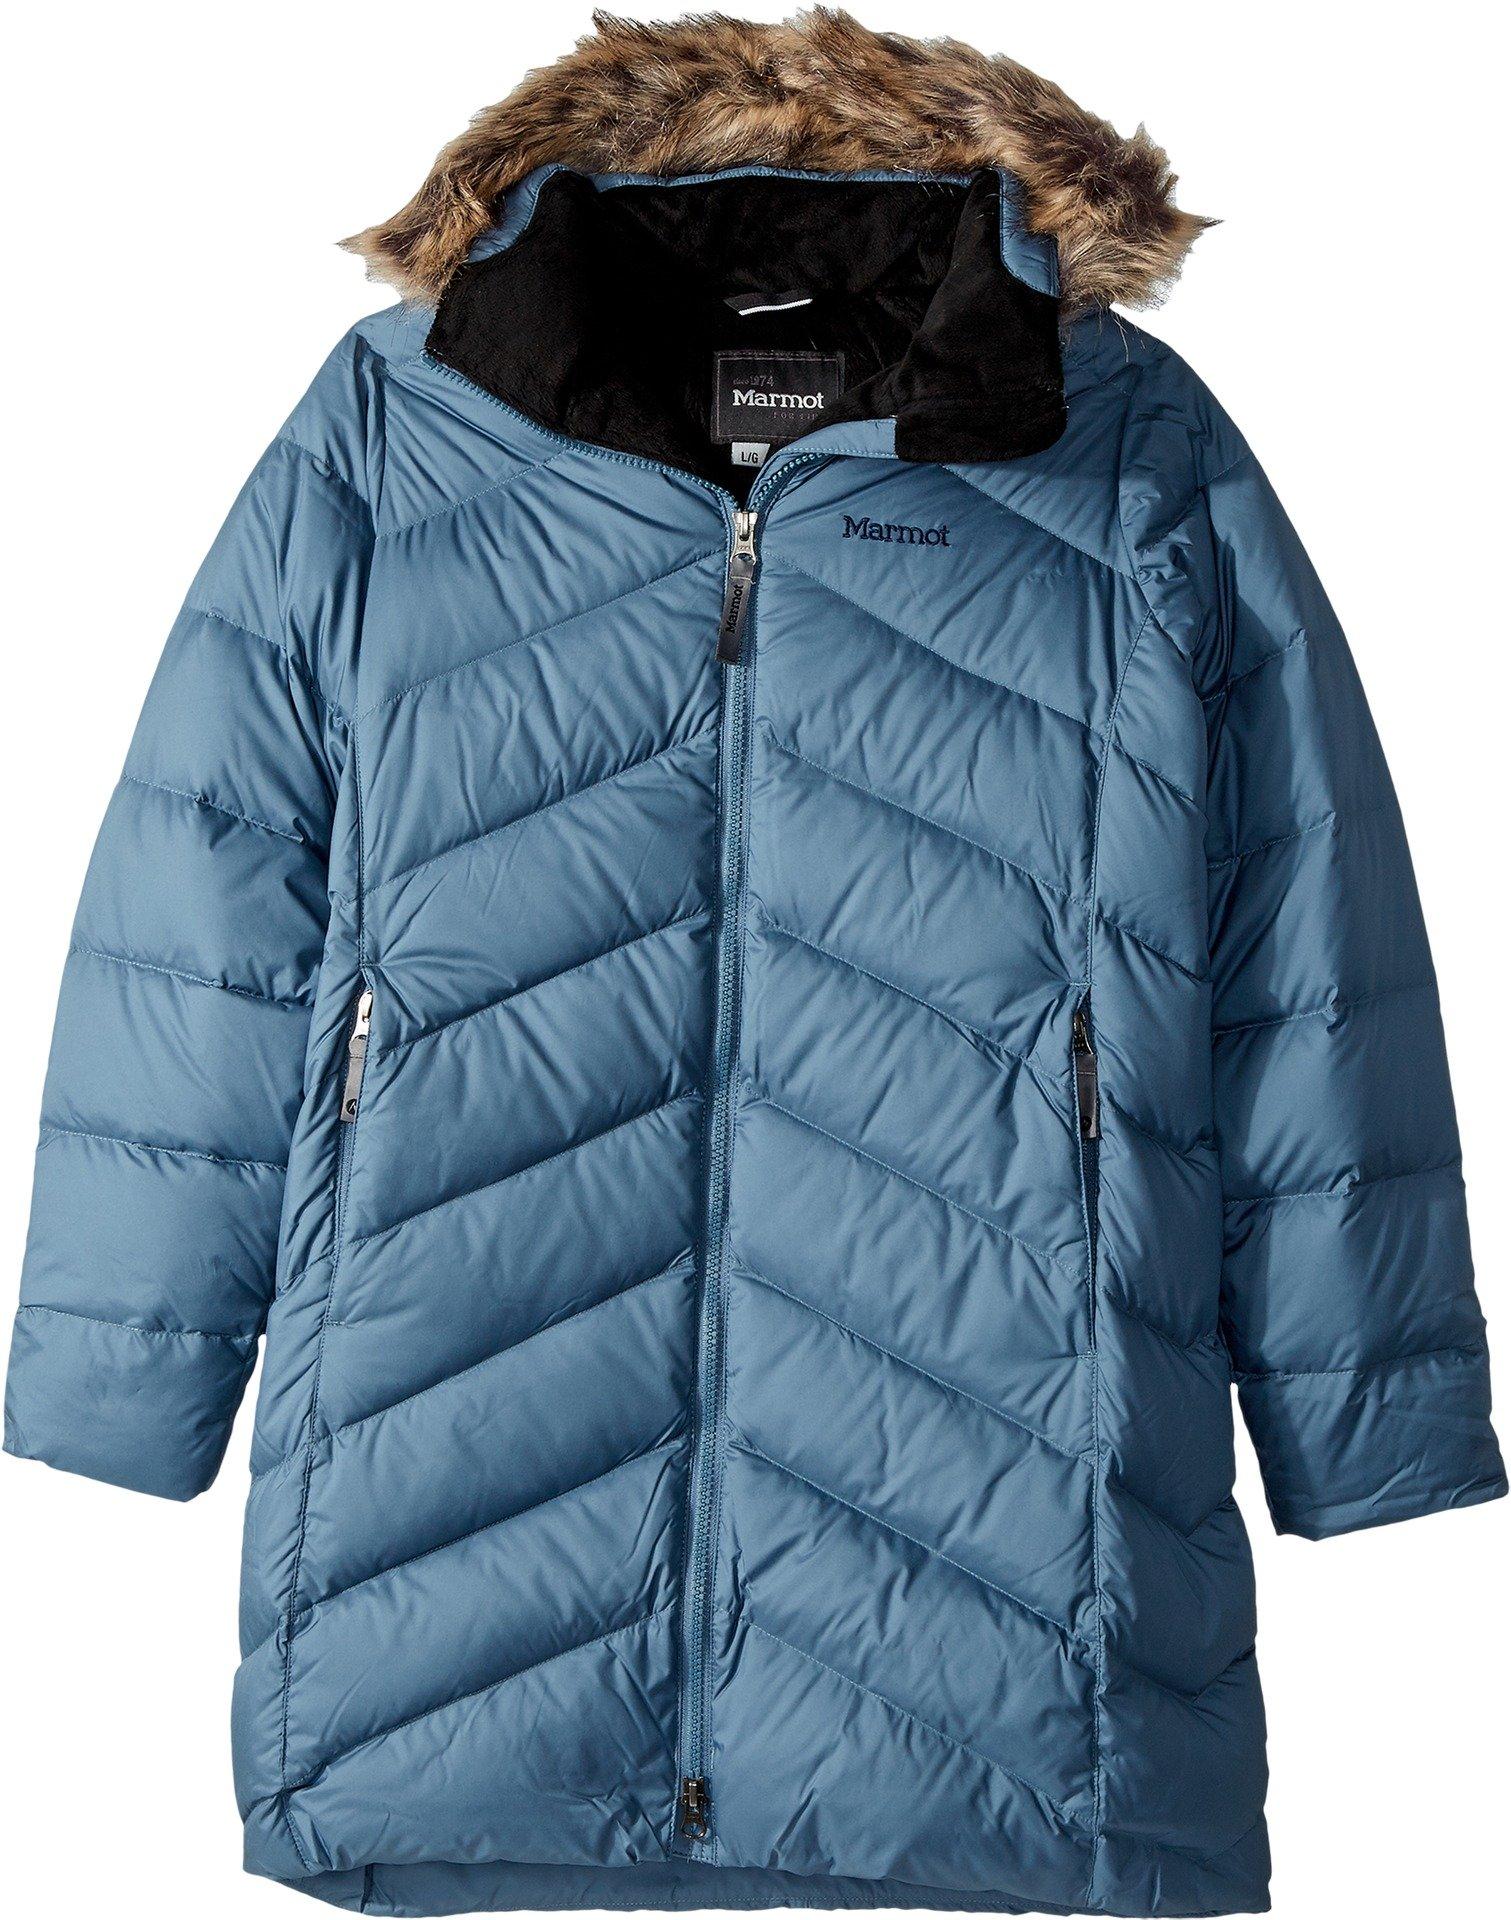 Marmot Kids Girl's Girls' Montreaux Coat (Little Kids/Big Kids) Storm Cloud Medium